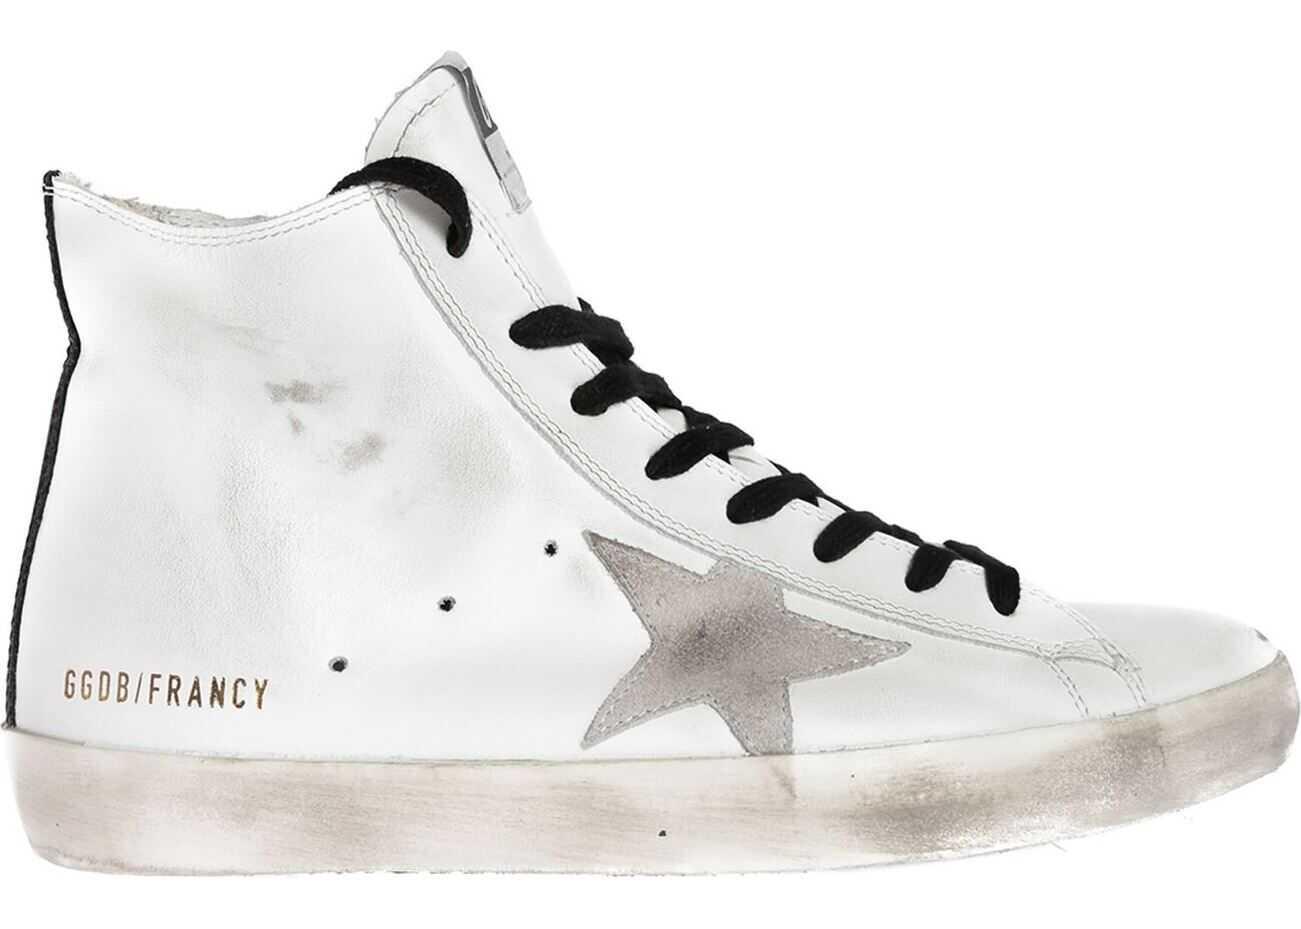 Golden Goose Francy Sneakers In White White